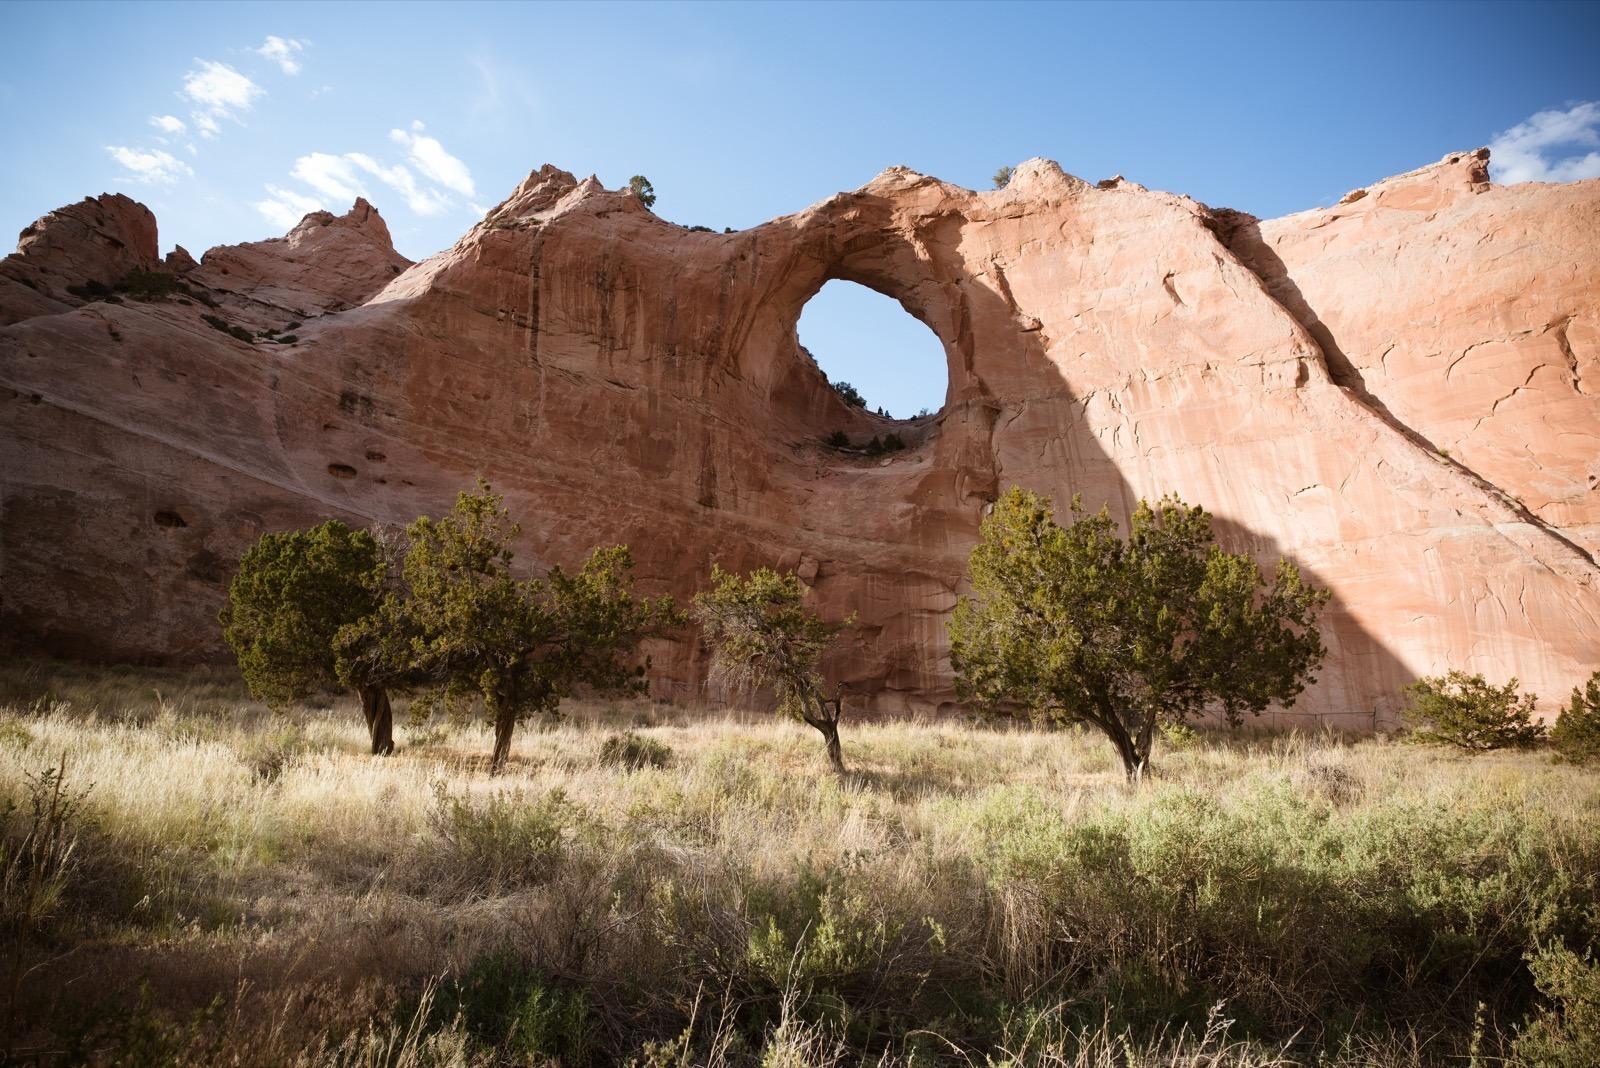 Jaydiamond-Taliman-navajo-nation-arizona-window-rock-navajo-tribal-park-veterans-memorial